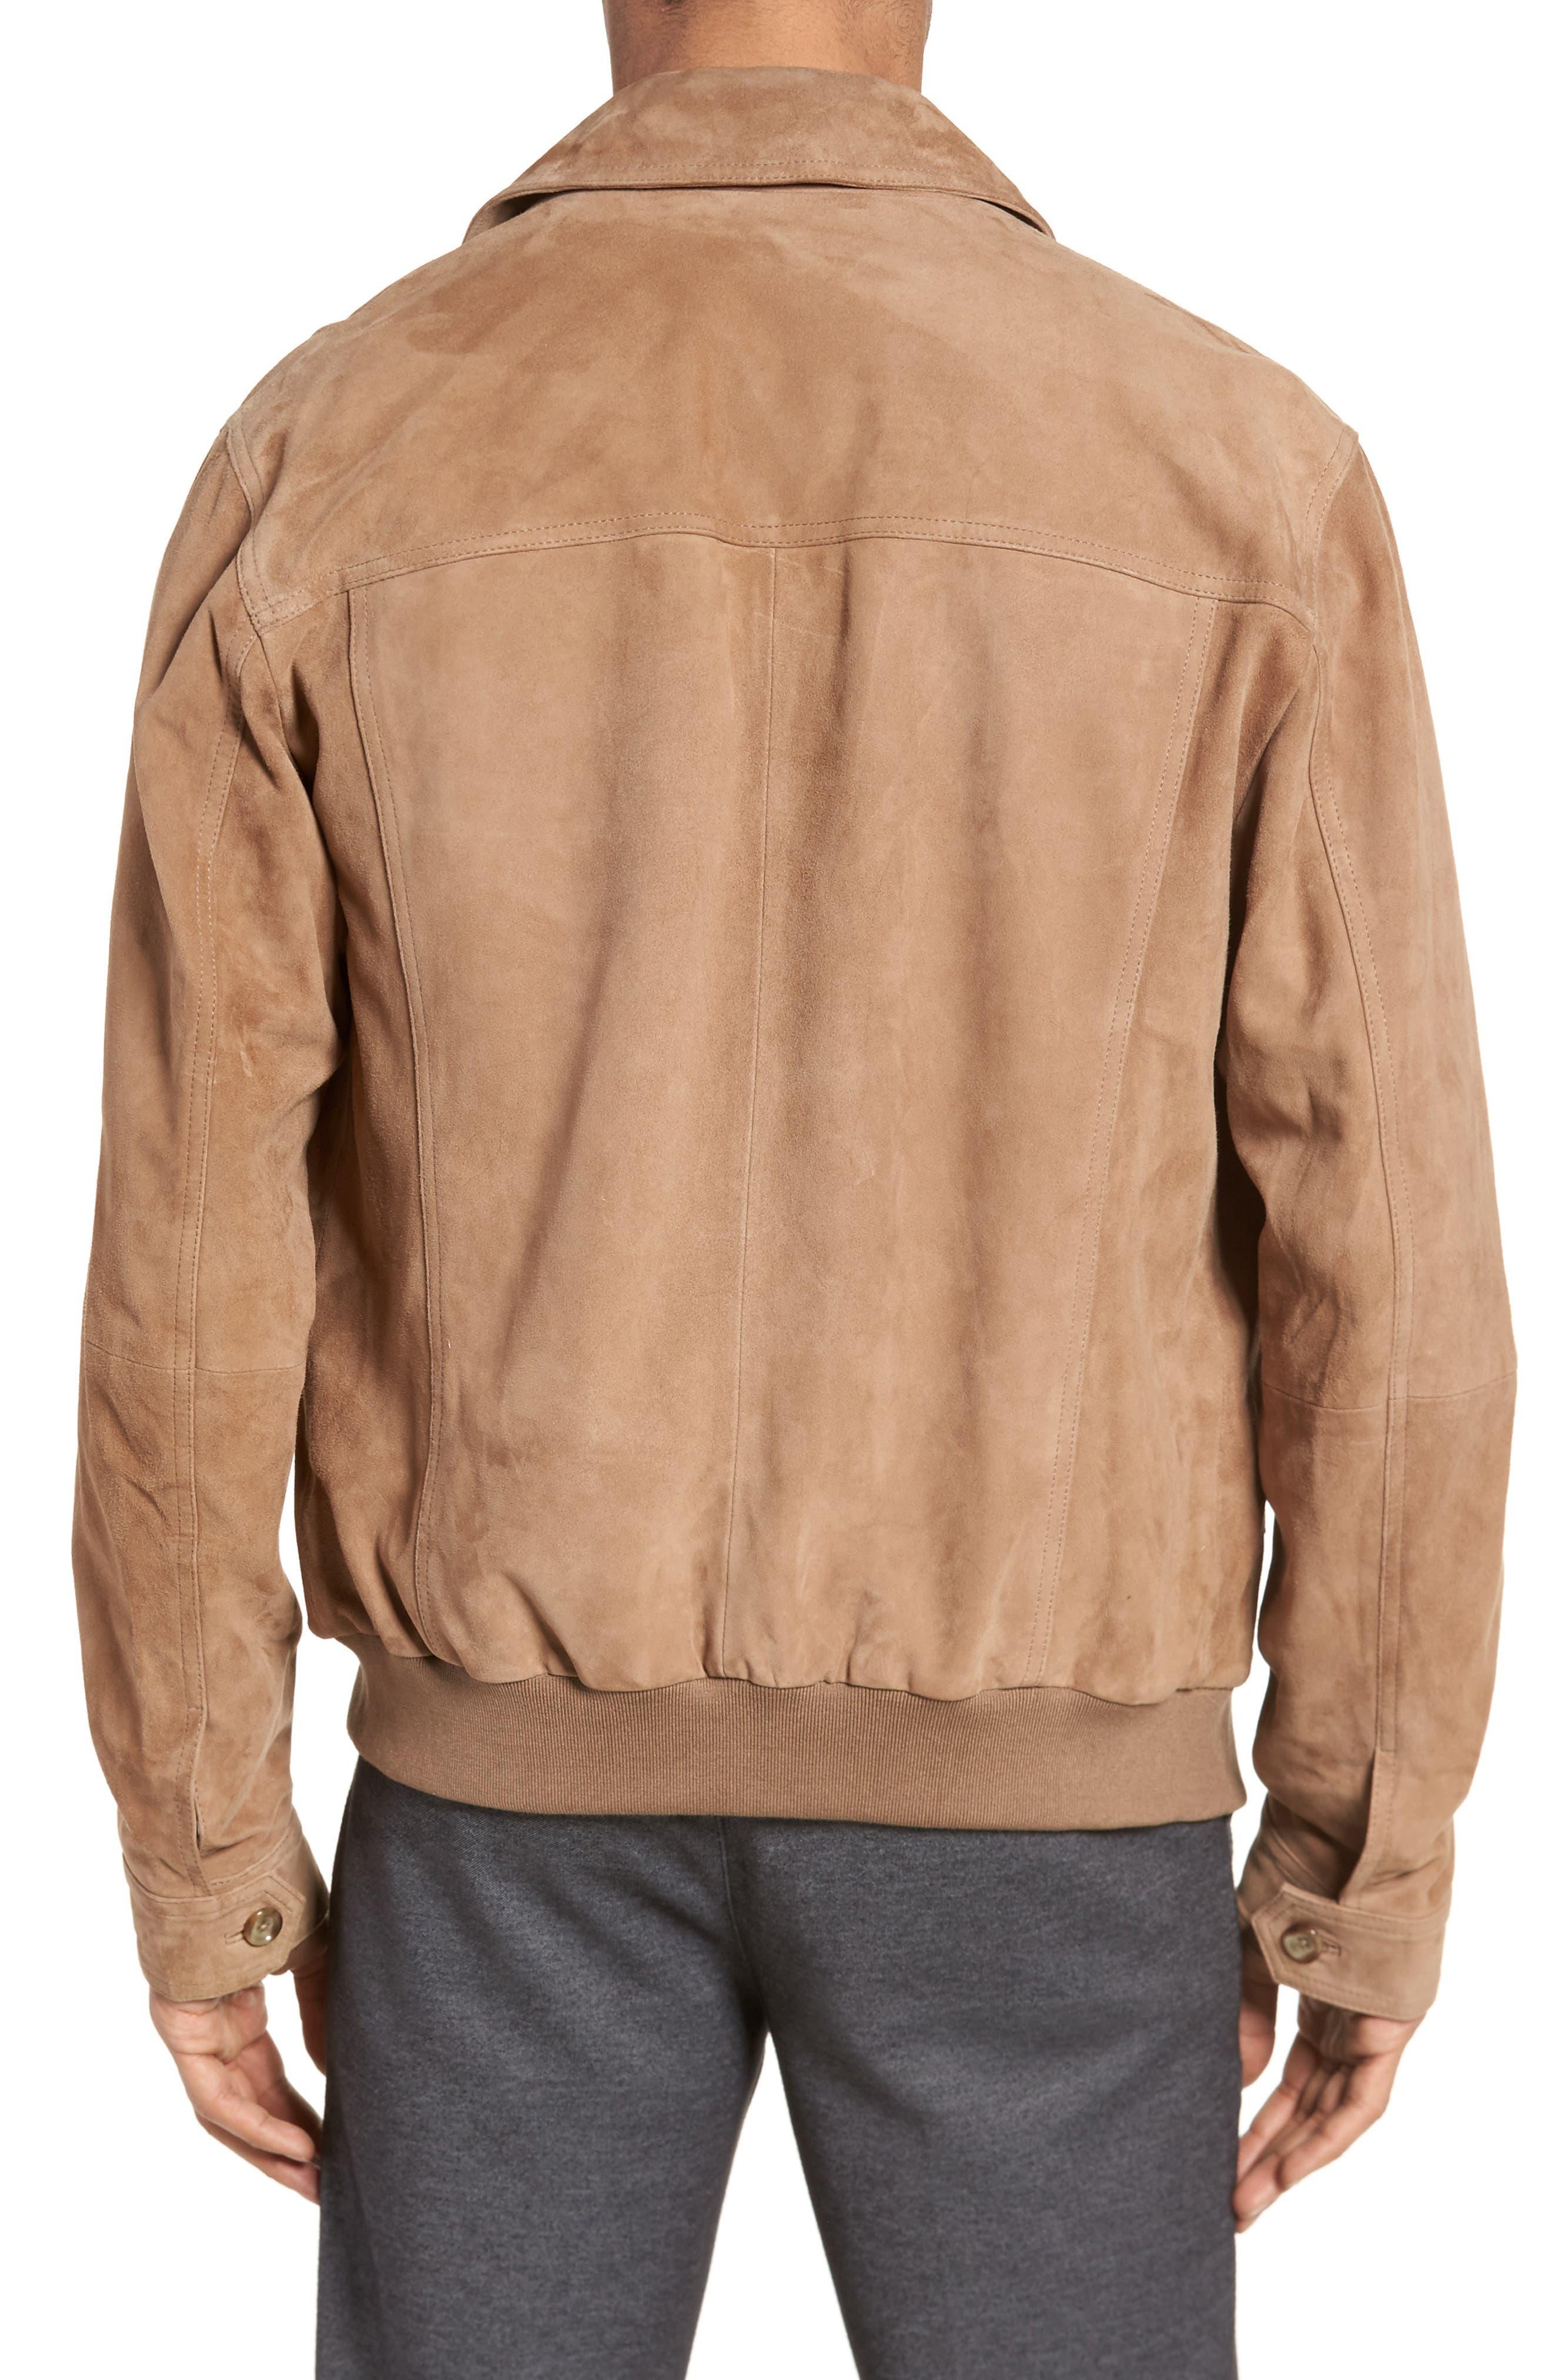 Avelan Suede Jacket,                             Alternate thumbnail 2, color,